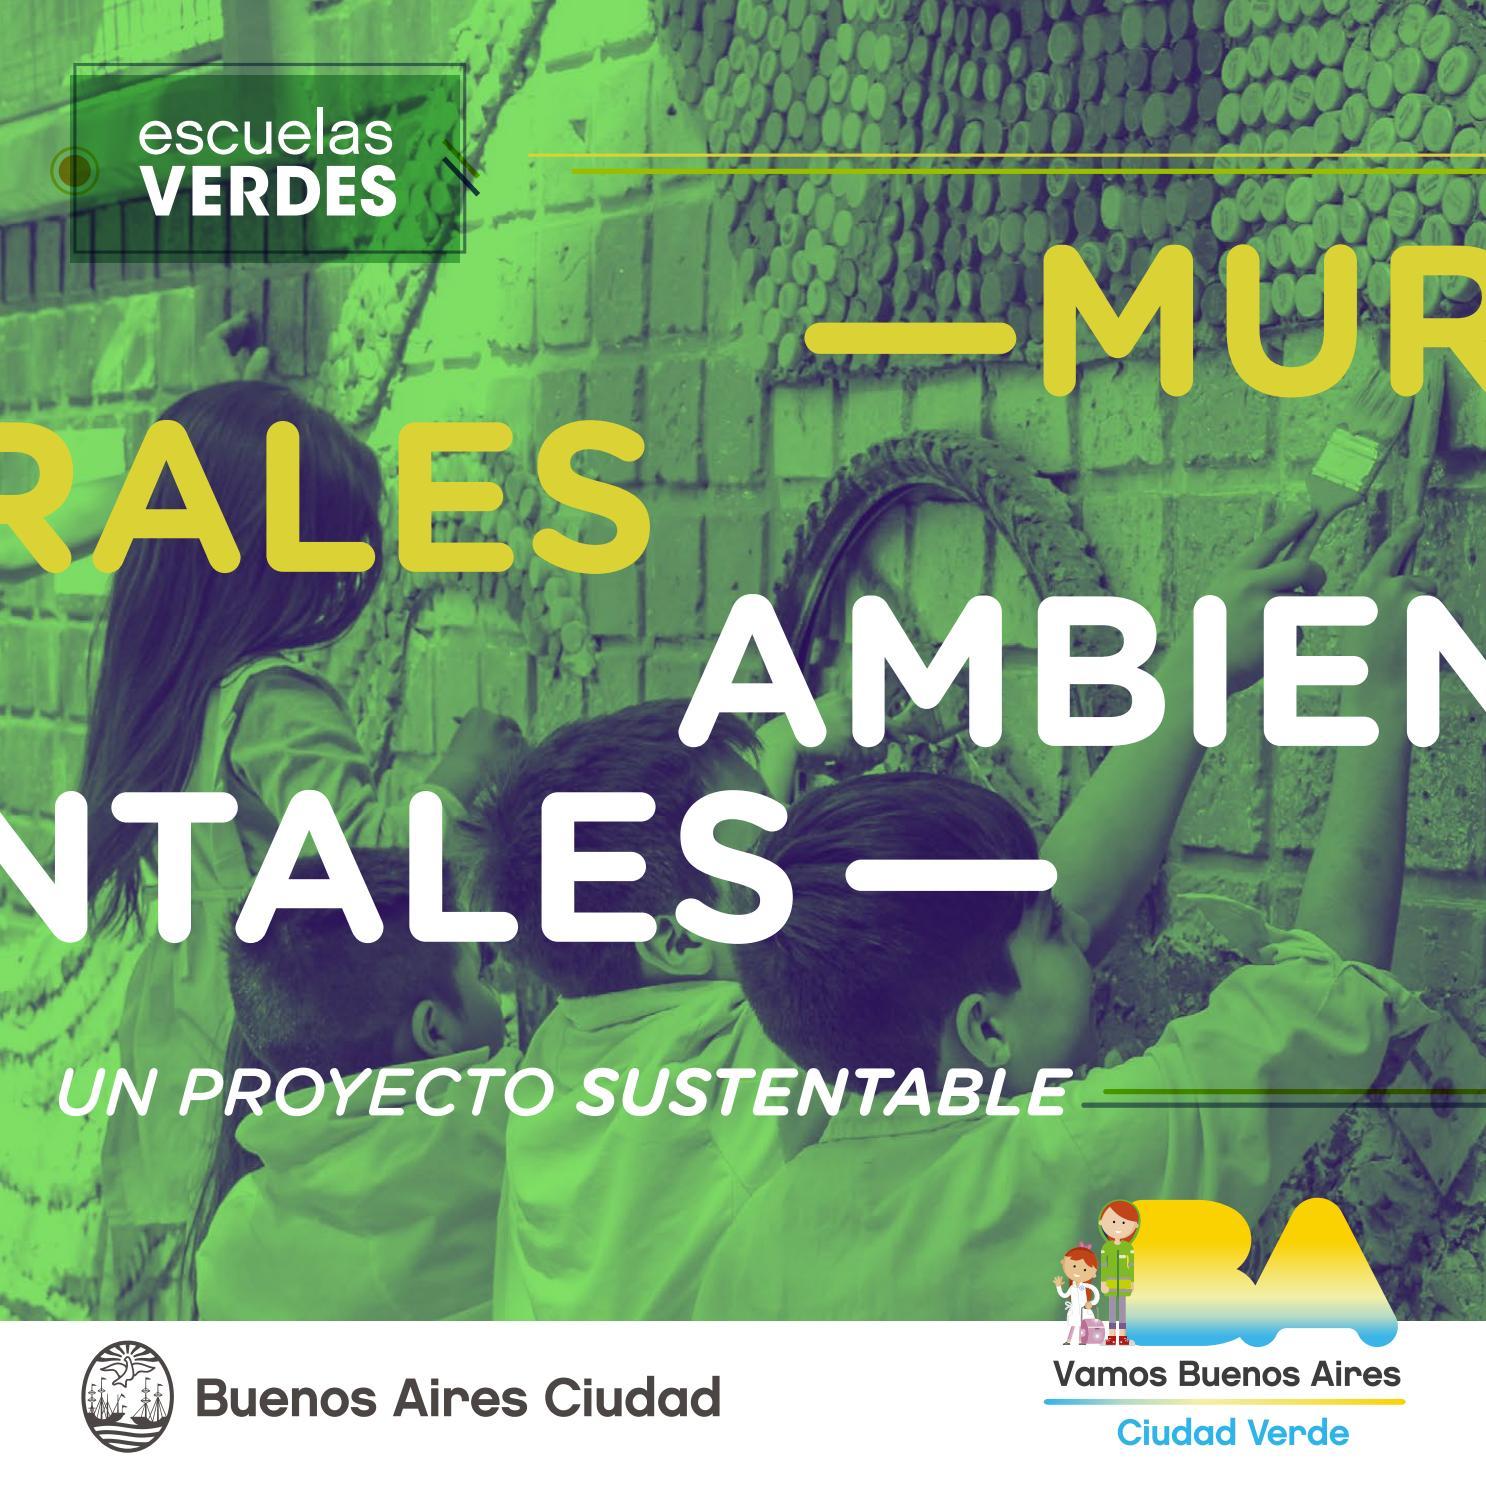 Murales Ambientales Escuelas Verdes By Escuelas Verdes Issuu